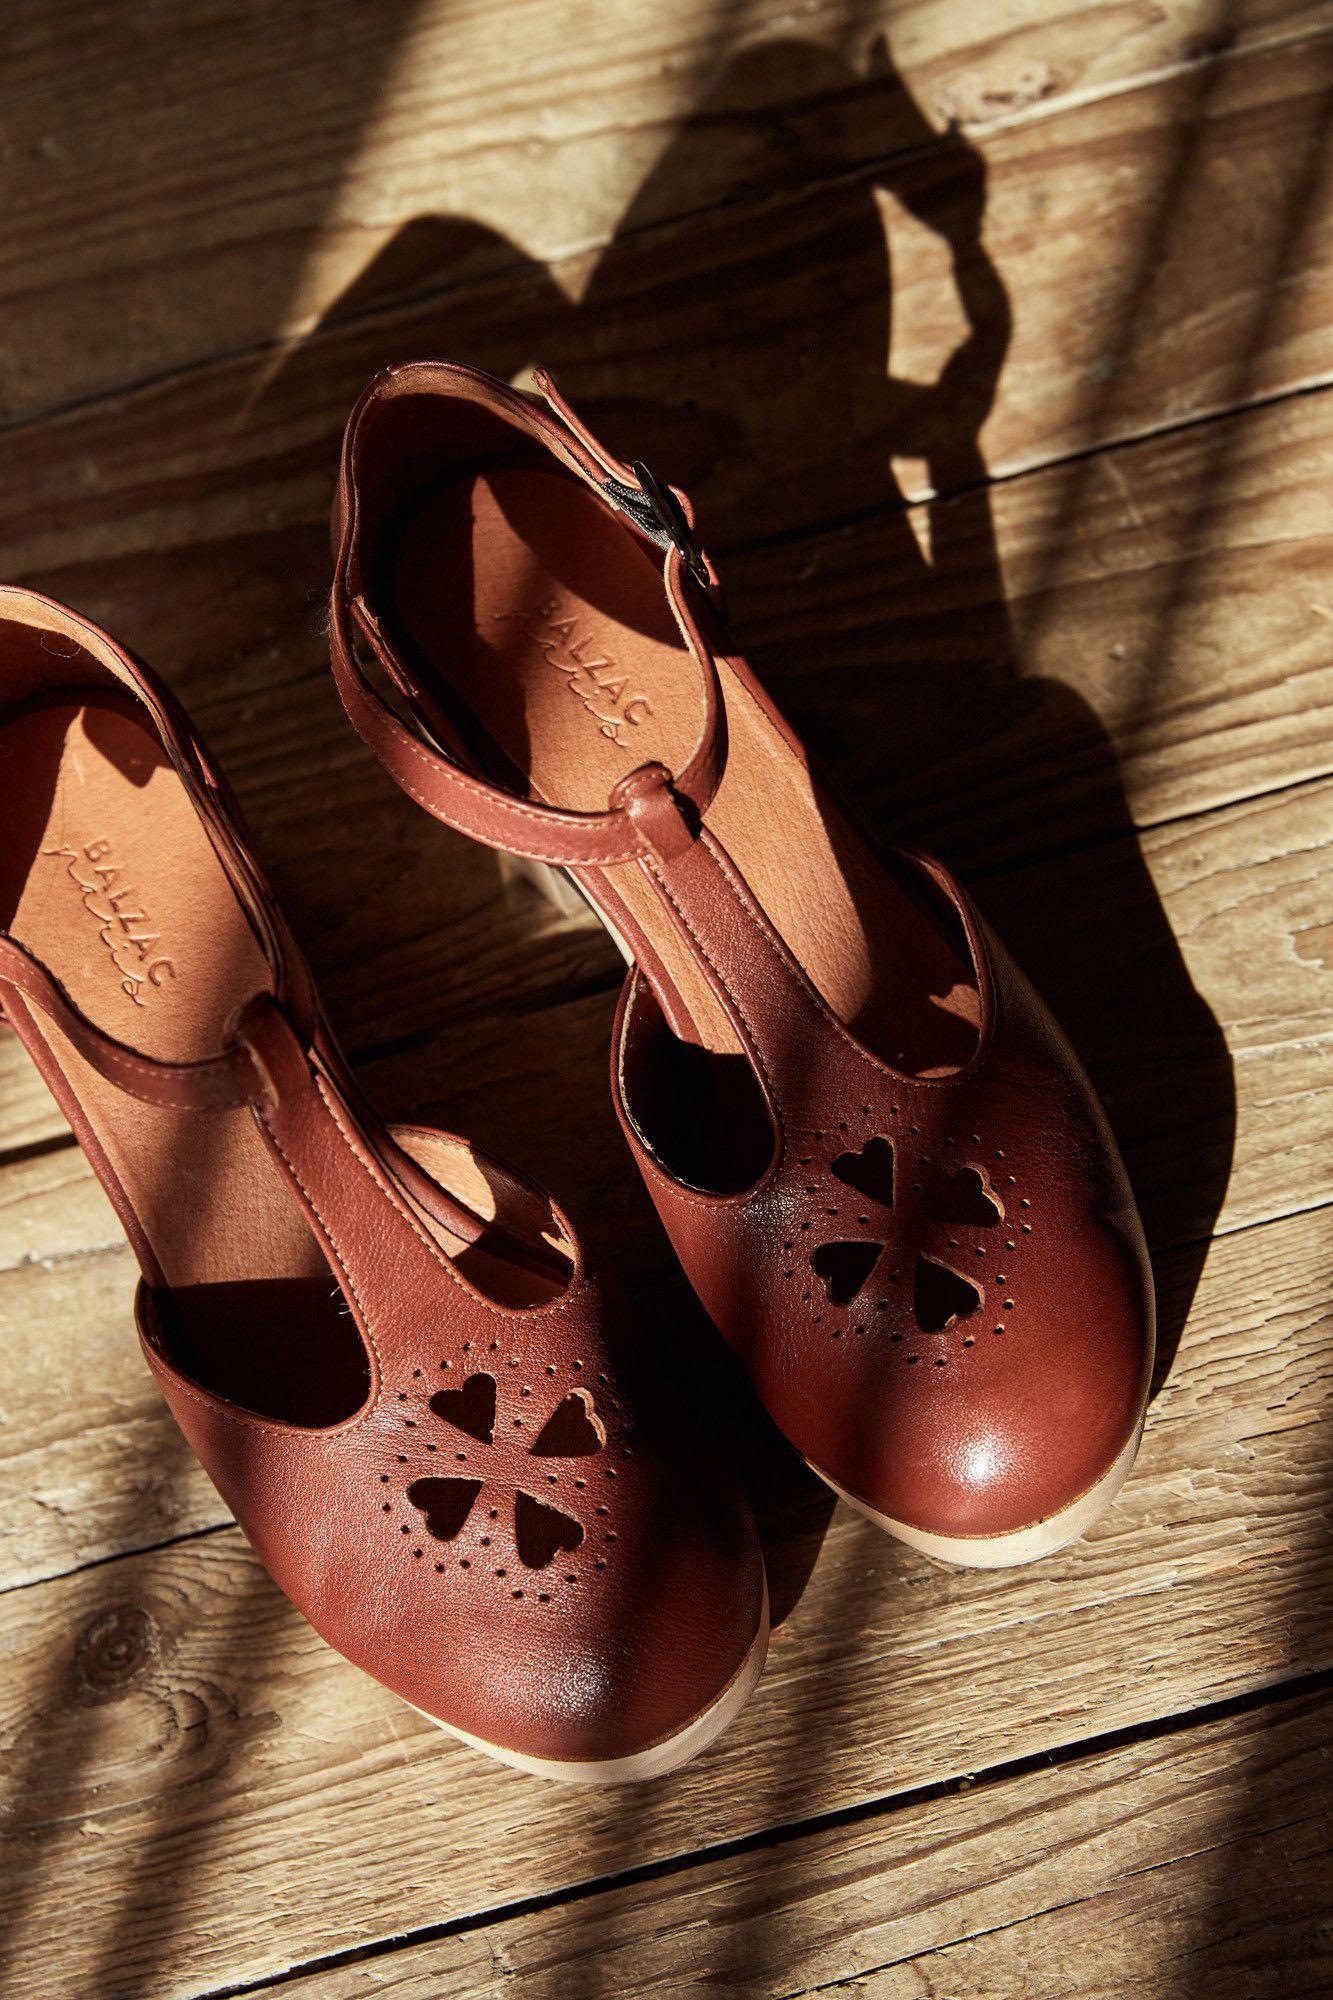 Balzac Chaussure ParisChaussures Myrtille Sabots Terracotta 9DHE2IWY